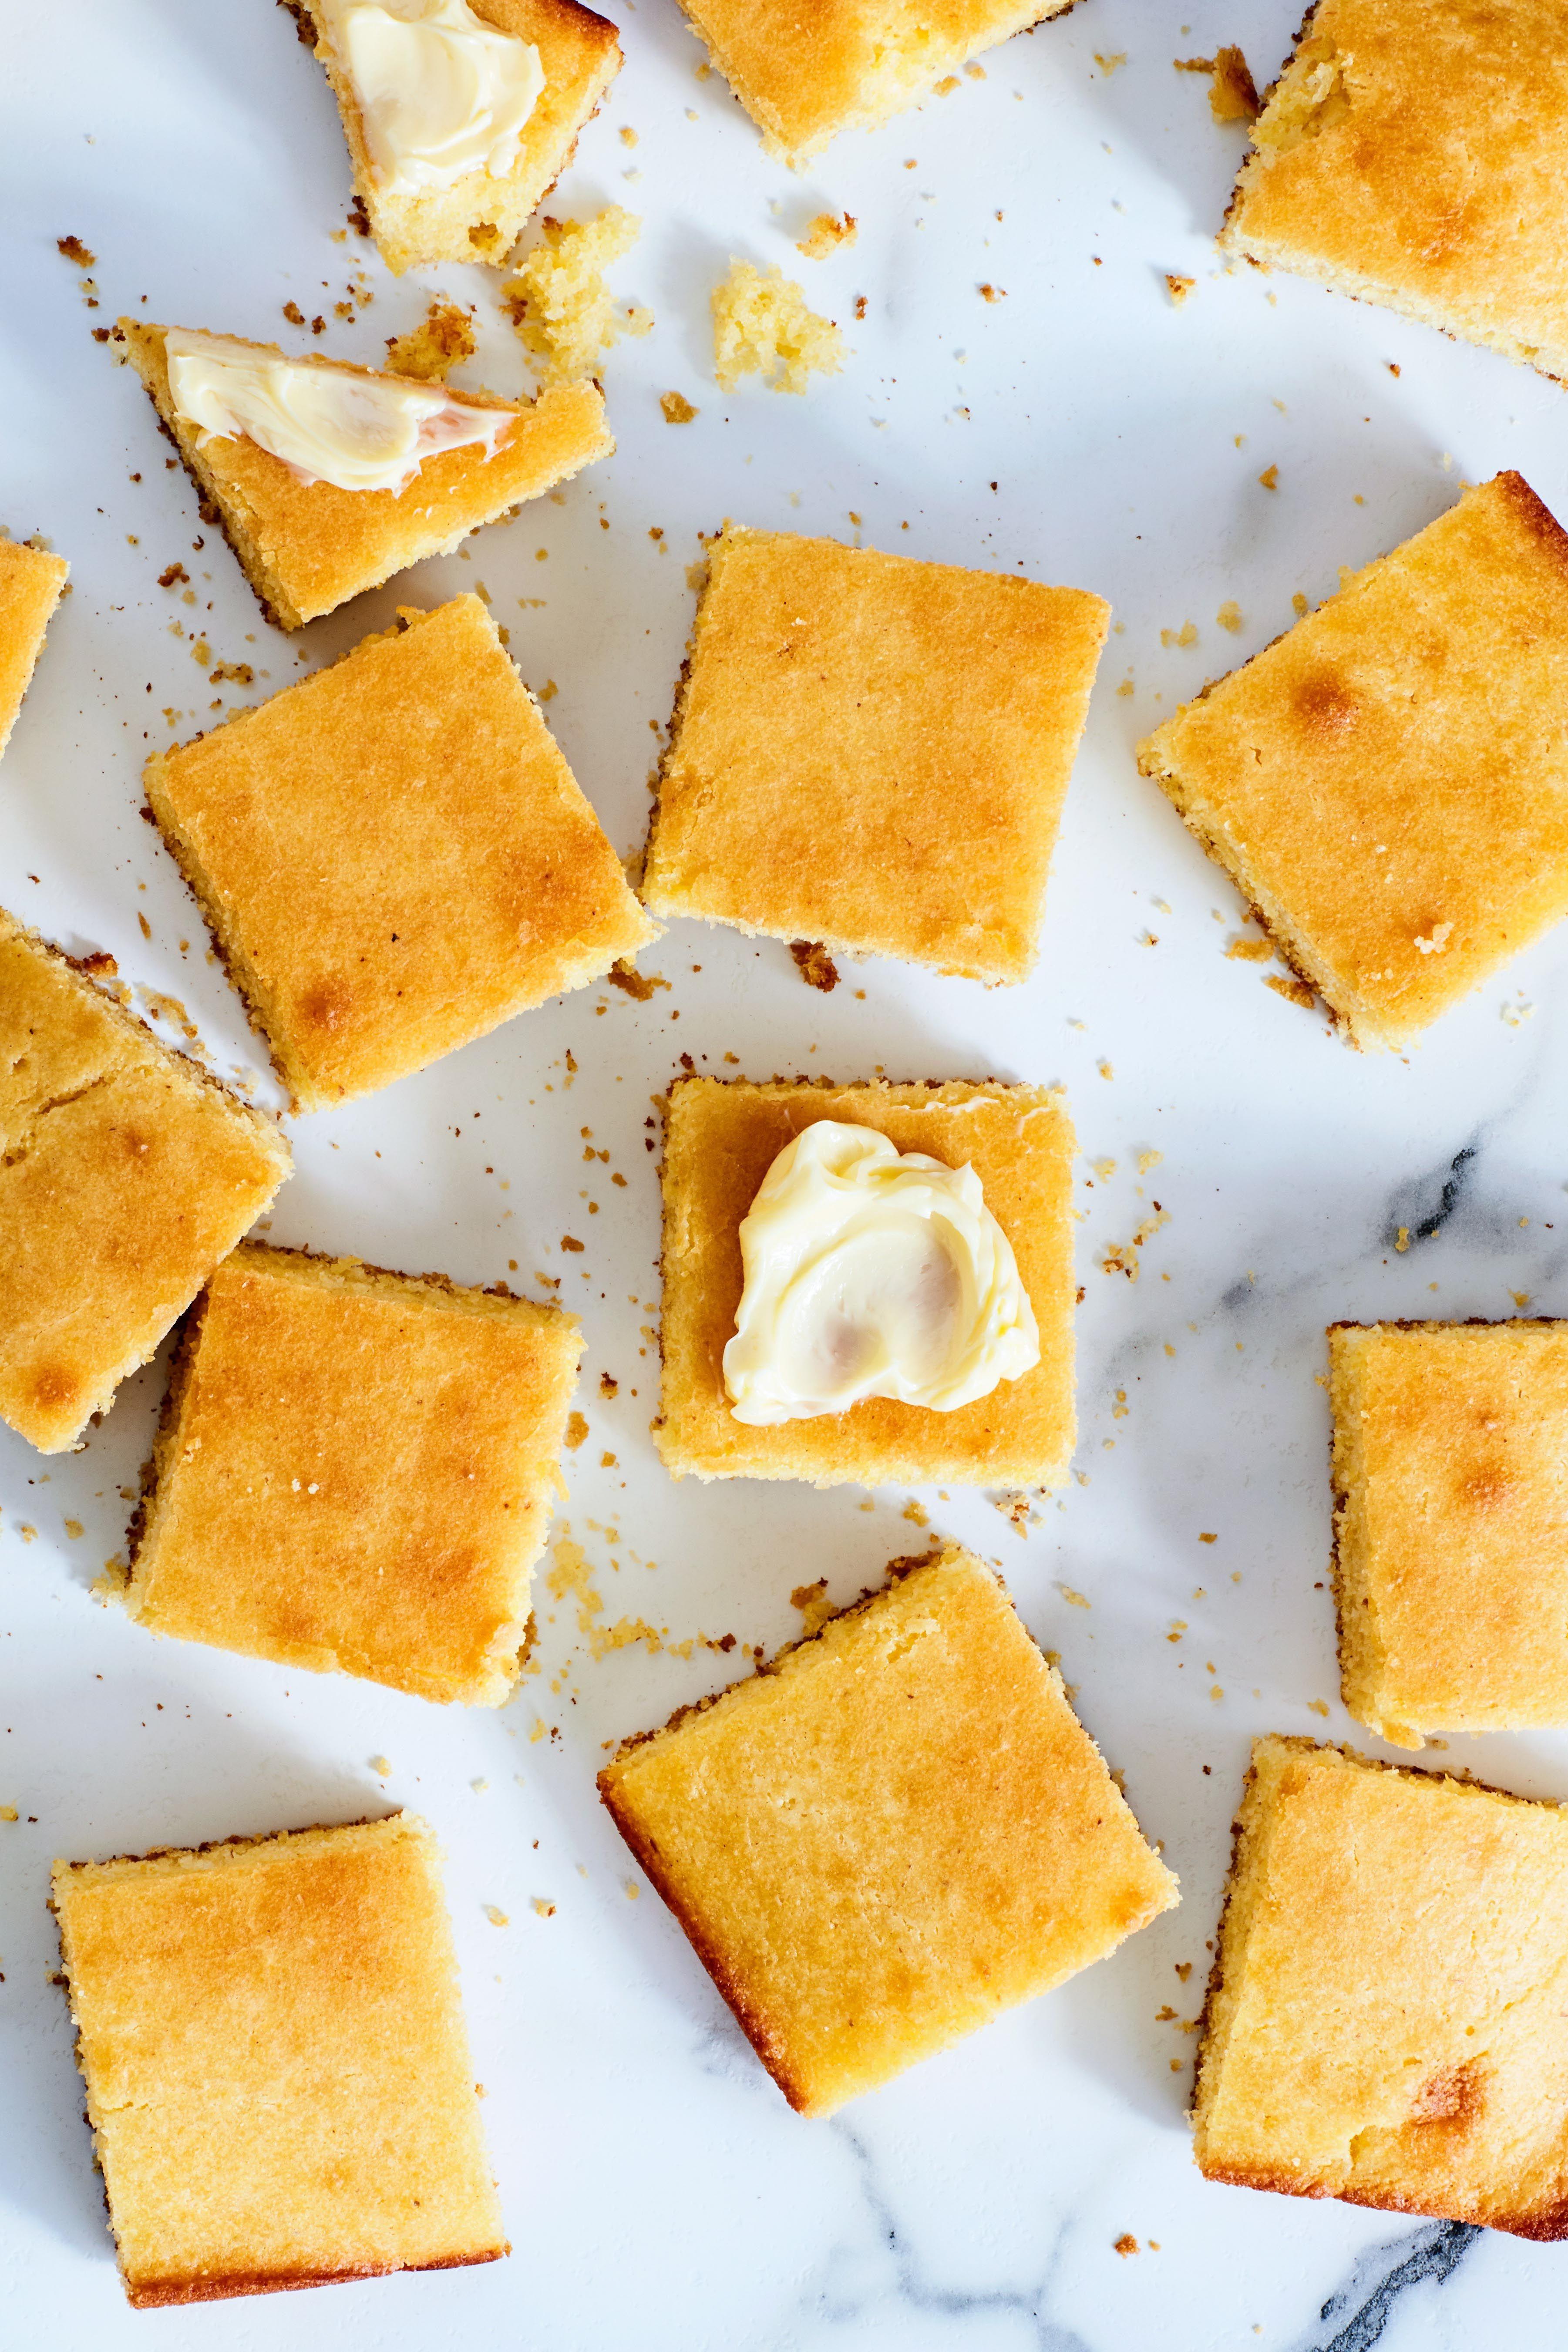 Golden Yellow Corn Bread Or Corn Muffins Recipe Corn Muffins Savoury Baking Cornbread